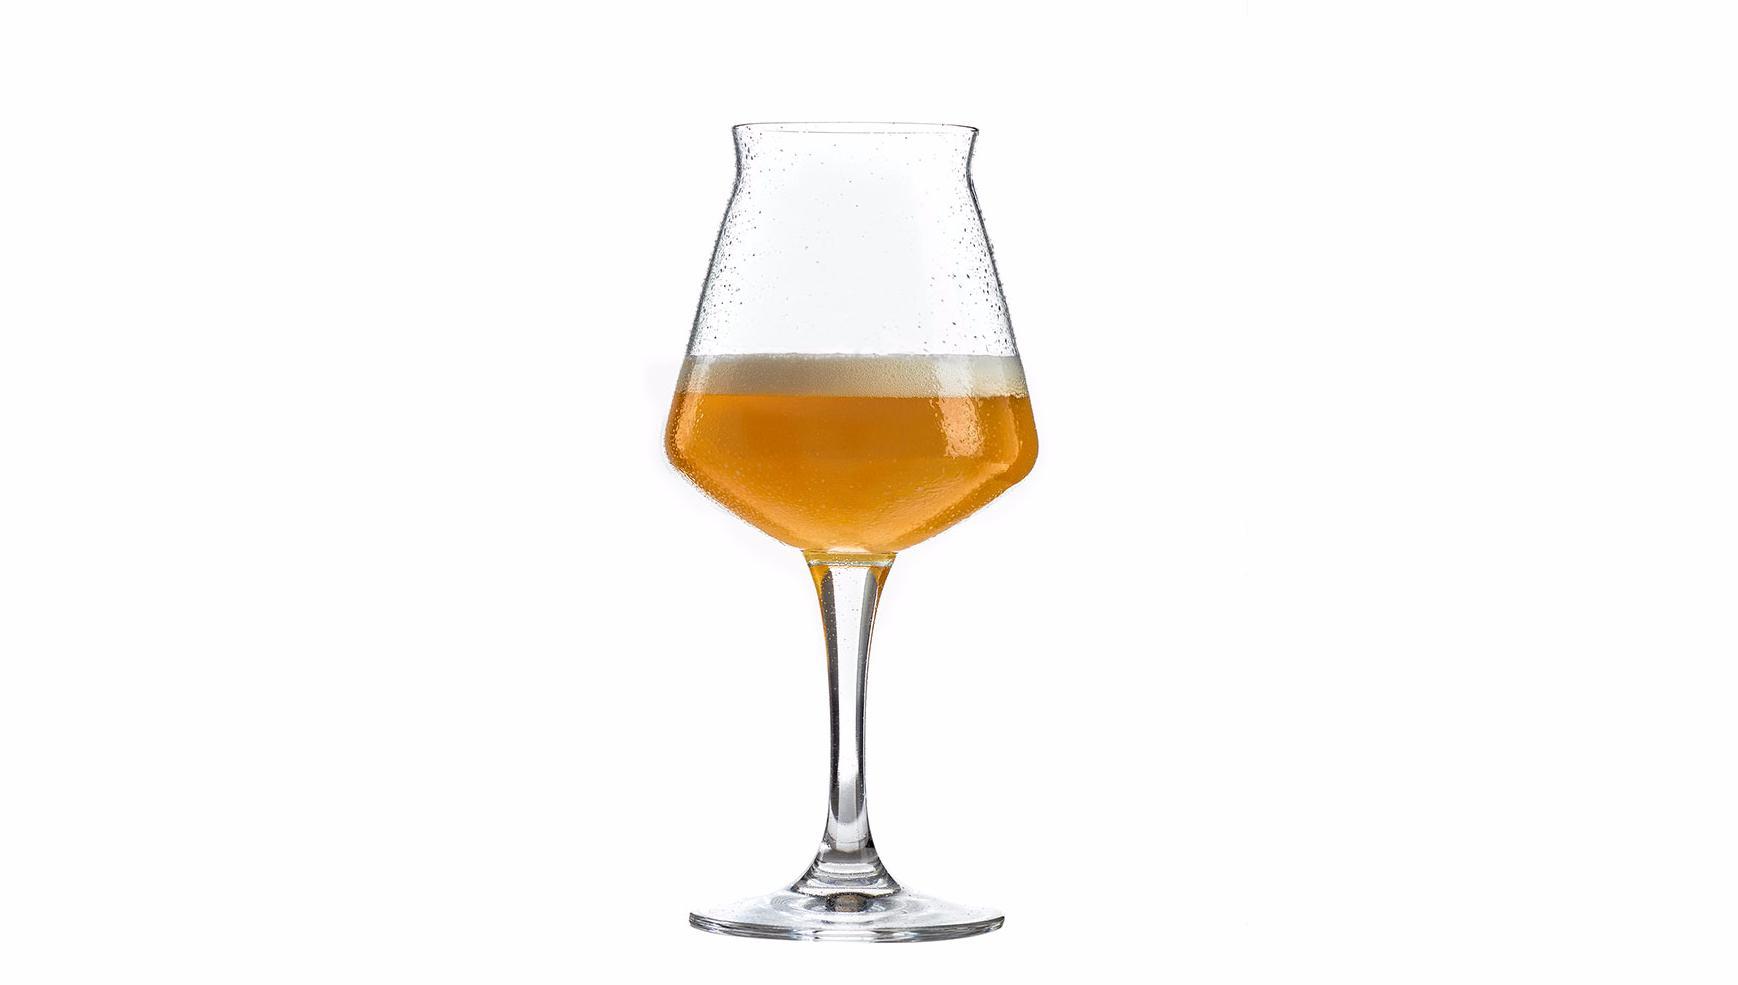 1st Bavarian Pale Ale